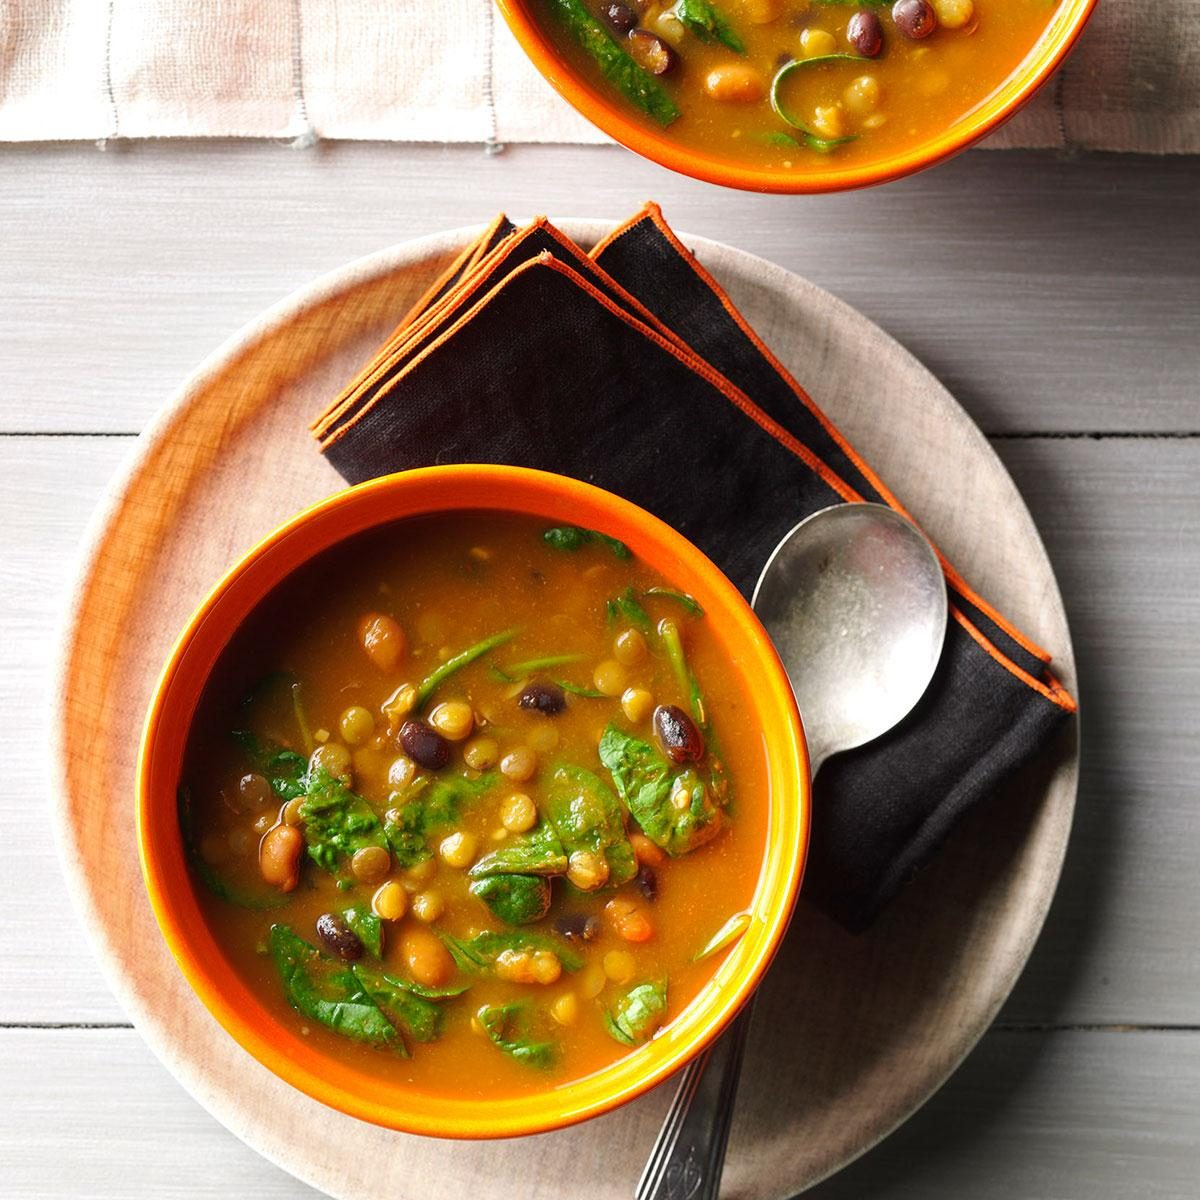 Georgia: Pumpkin-Lentil Soup